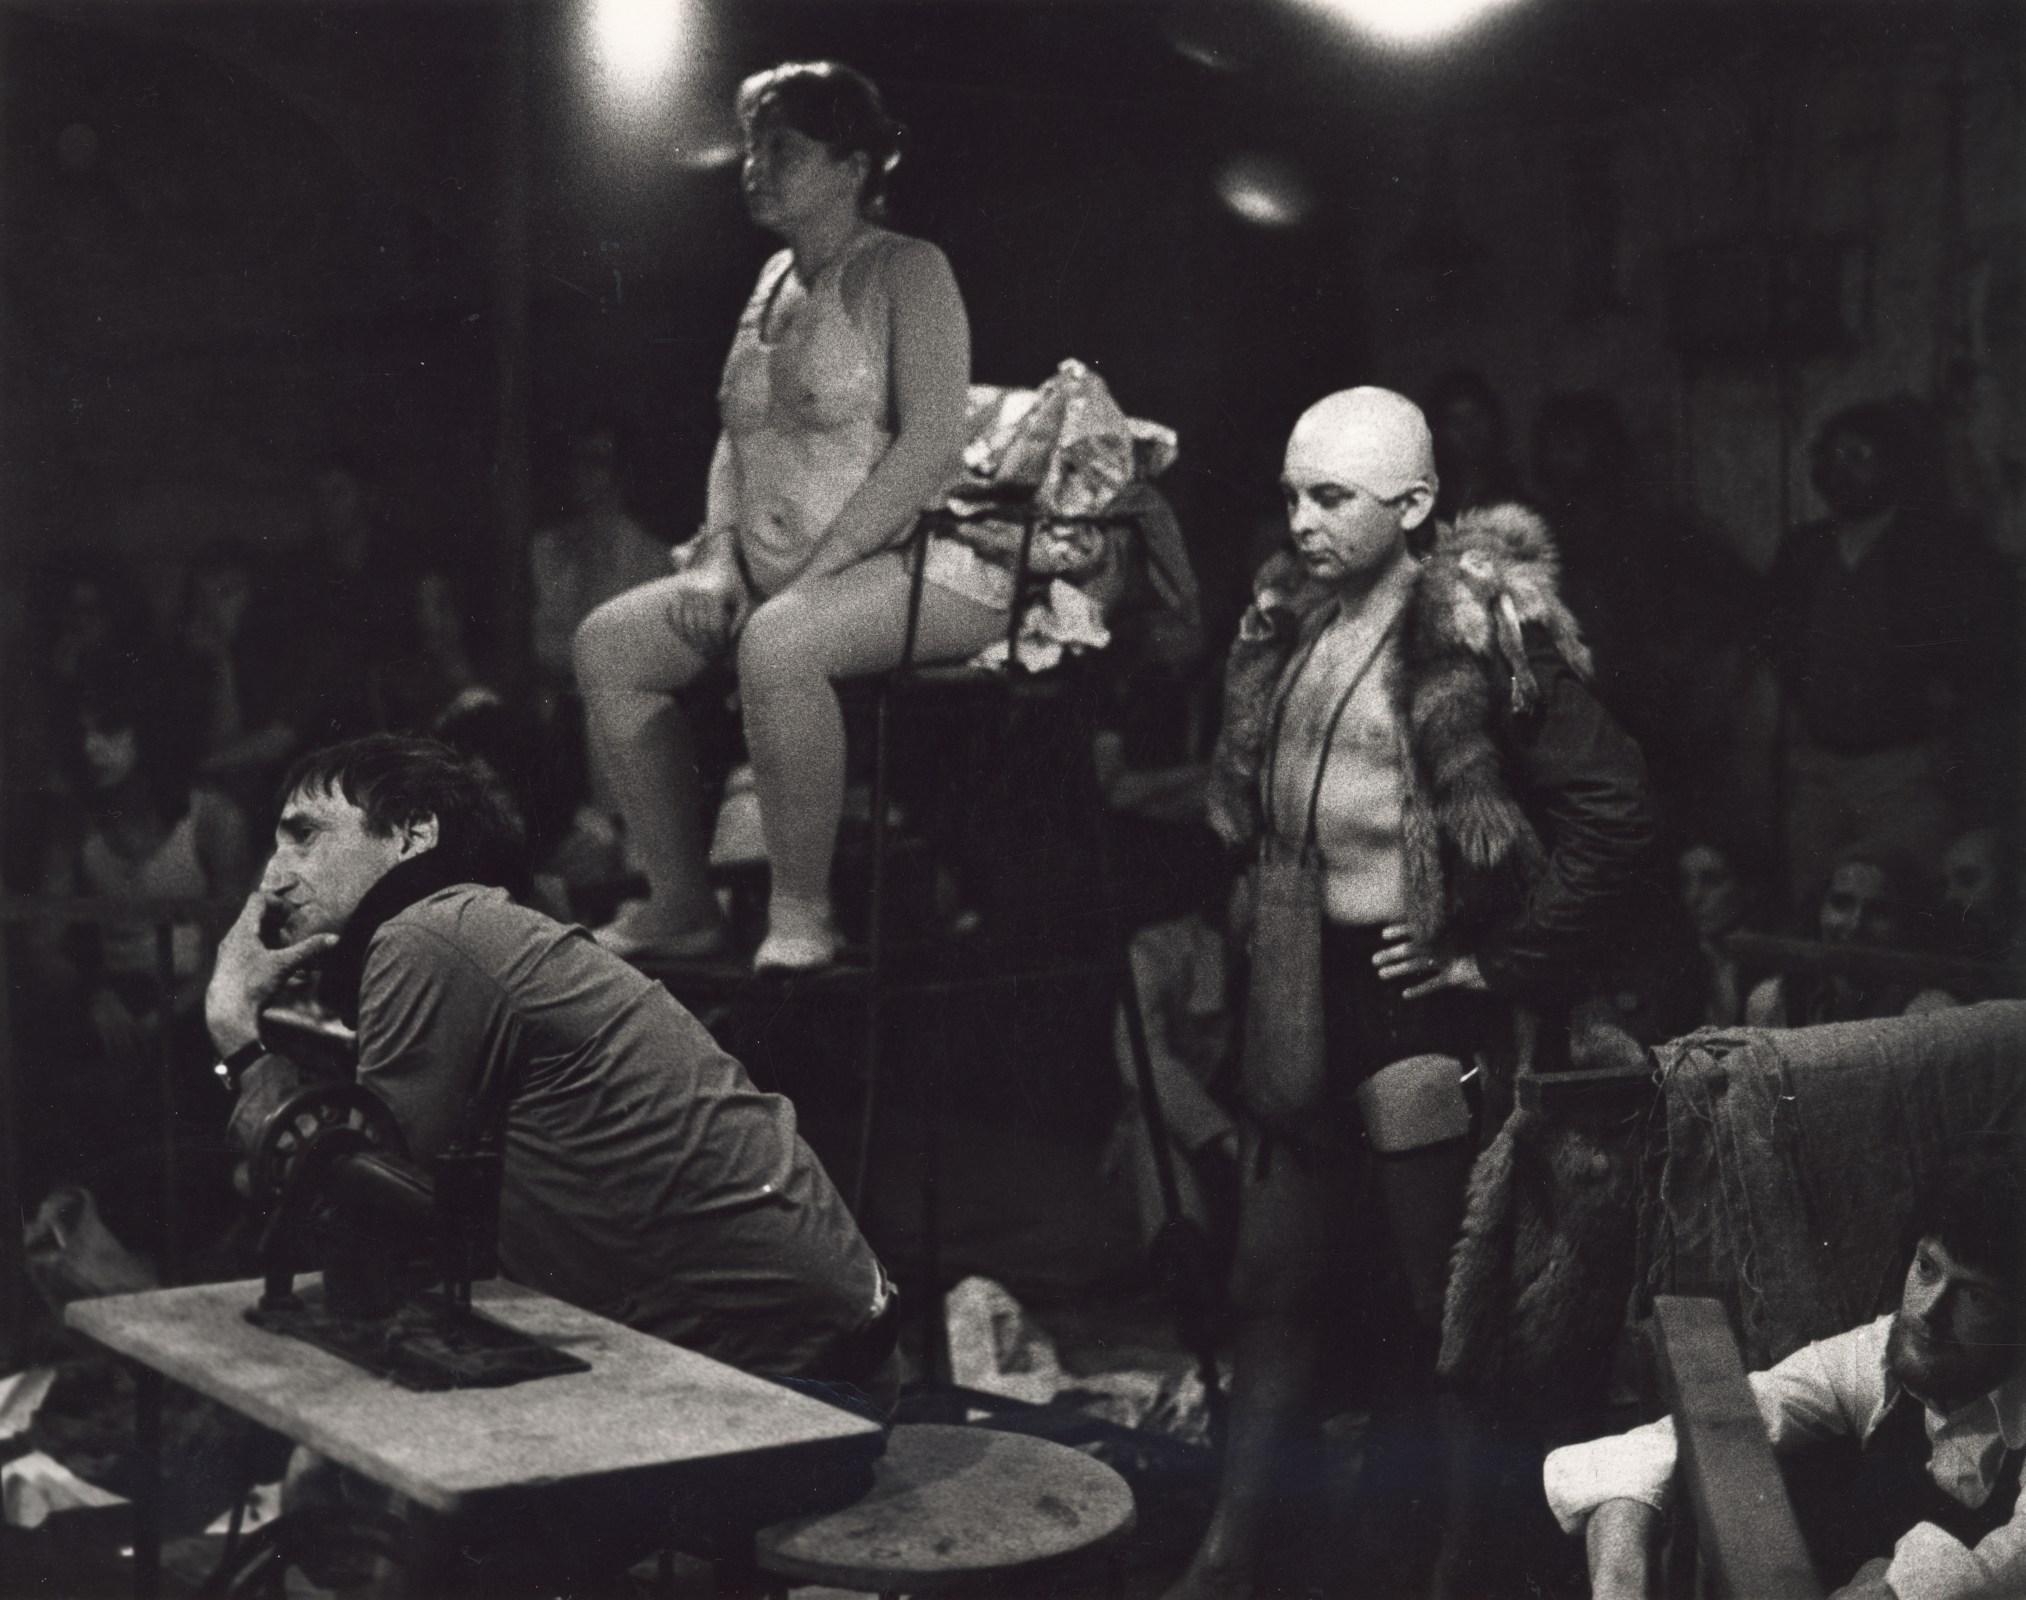 'The Water Hen, Cricot-2 Theatre, Edinburgh 1972. Photograph by Richard Demarco'